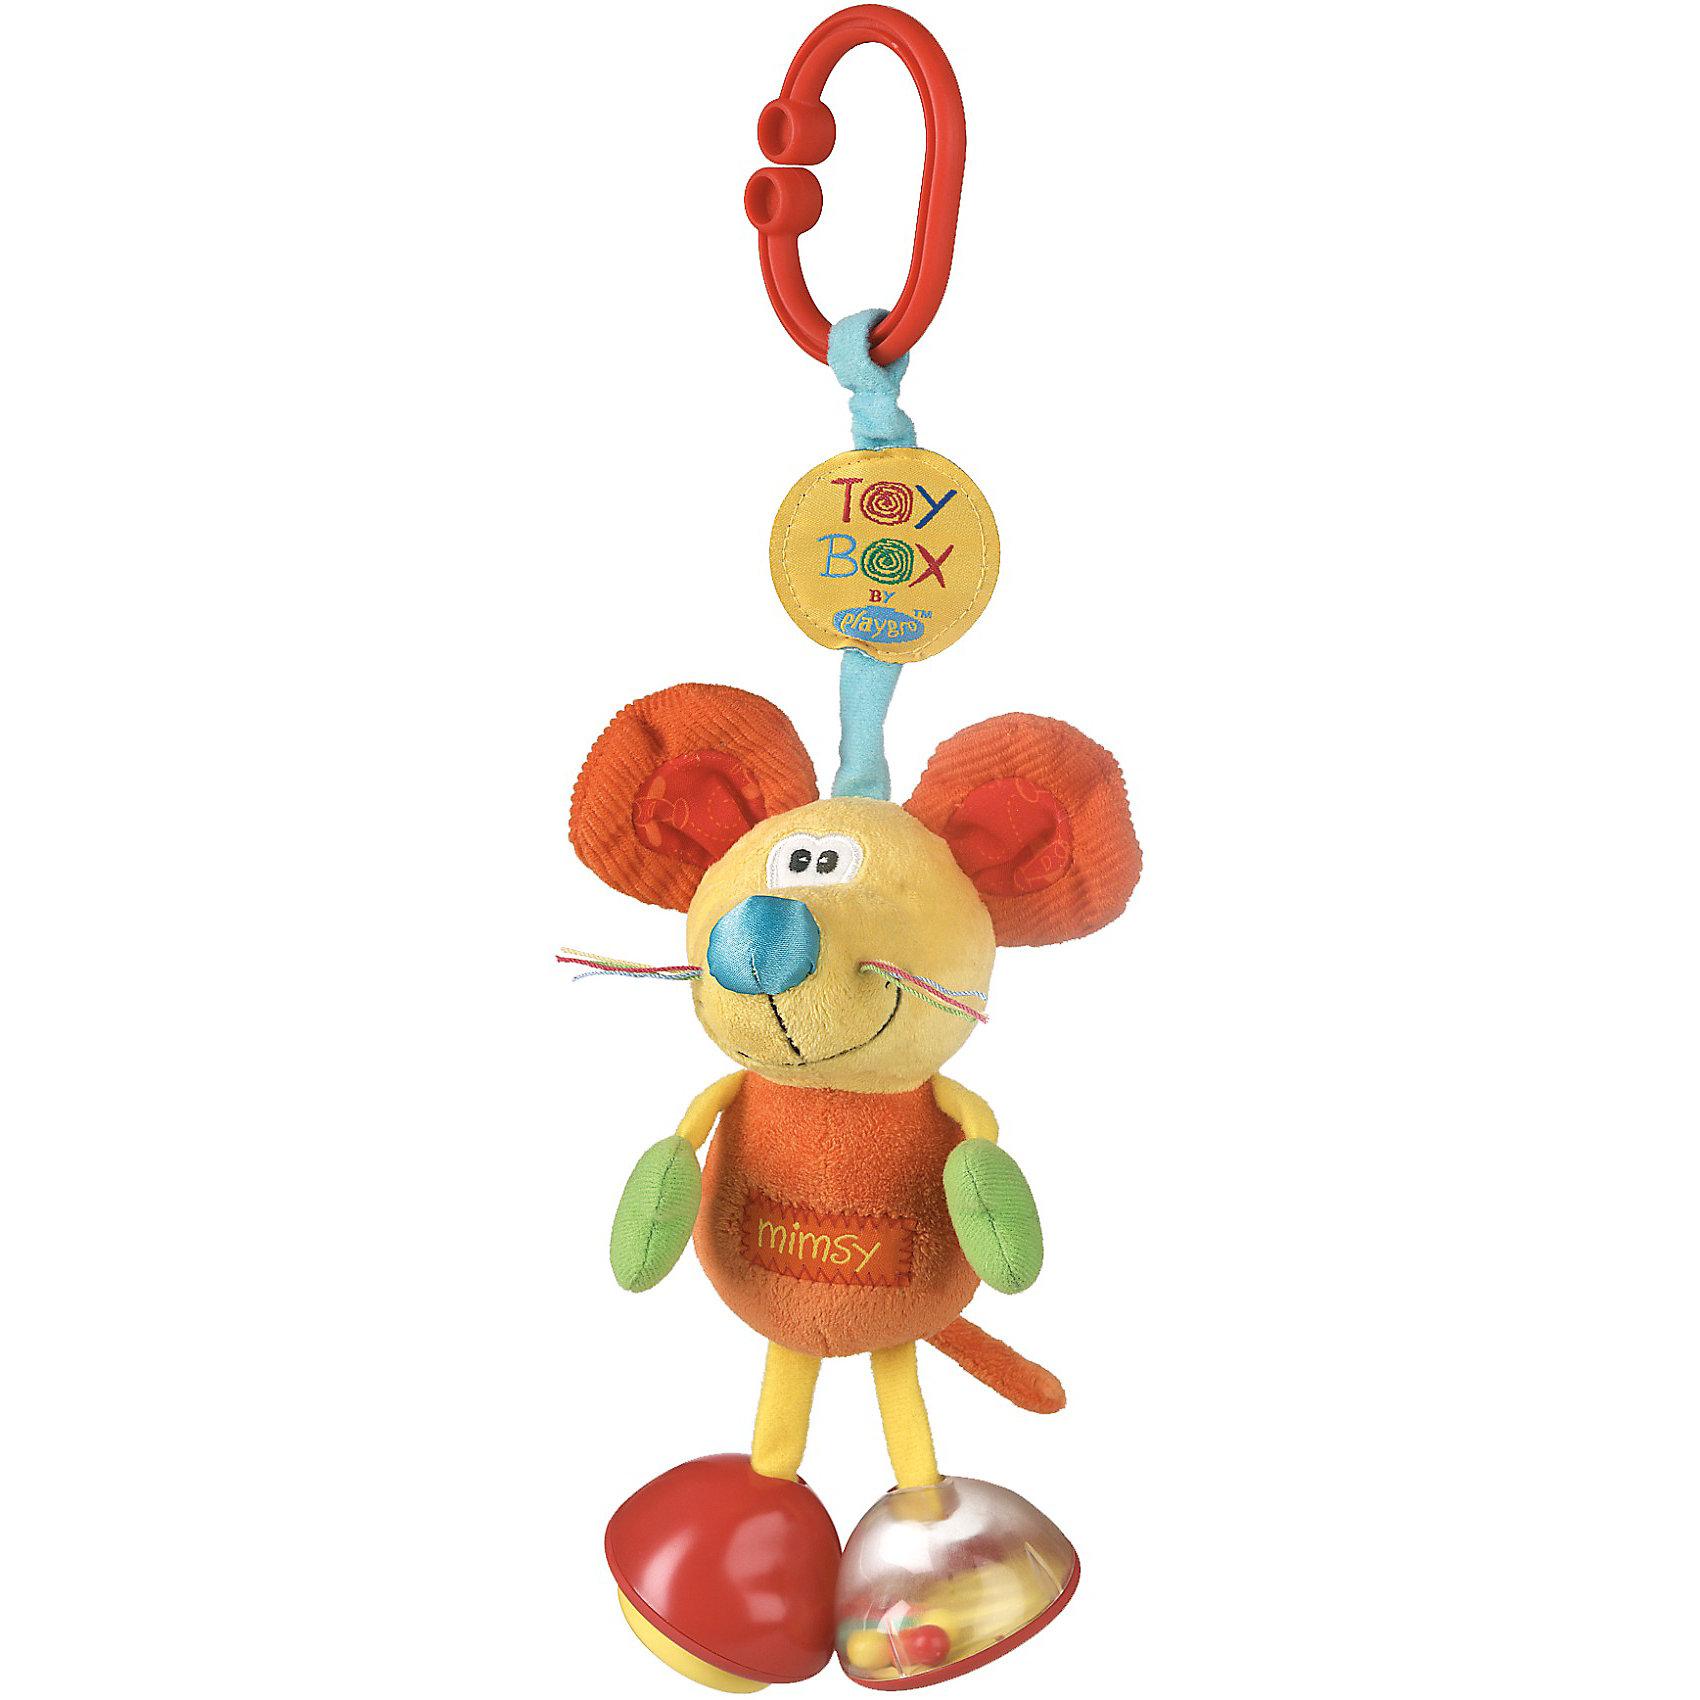 Playgro Мягкая игрушка-подвеска, Playgro playgro игрушка подвеска собака 111840